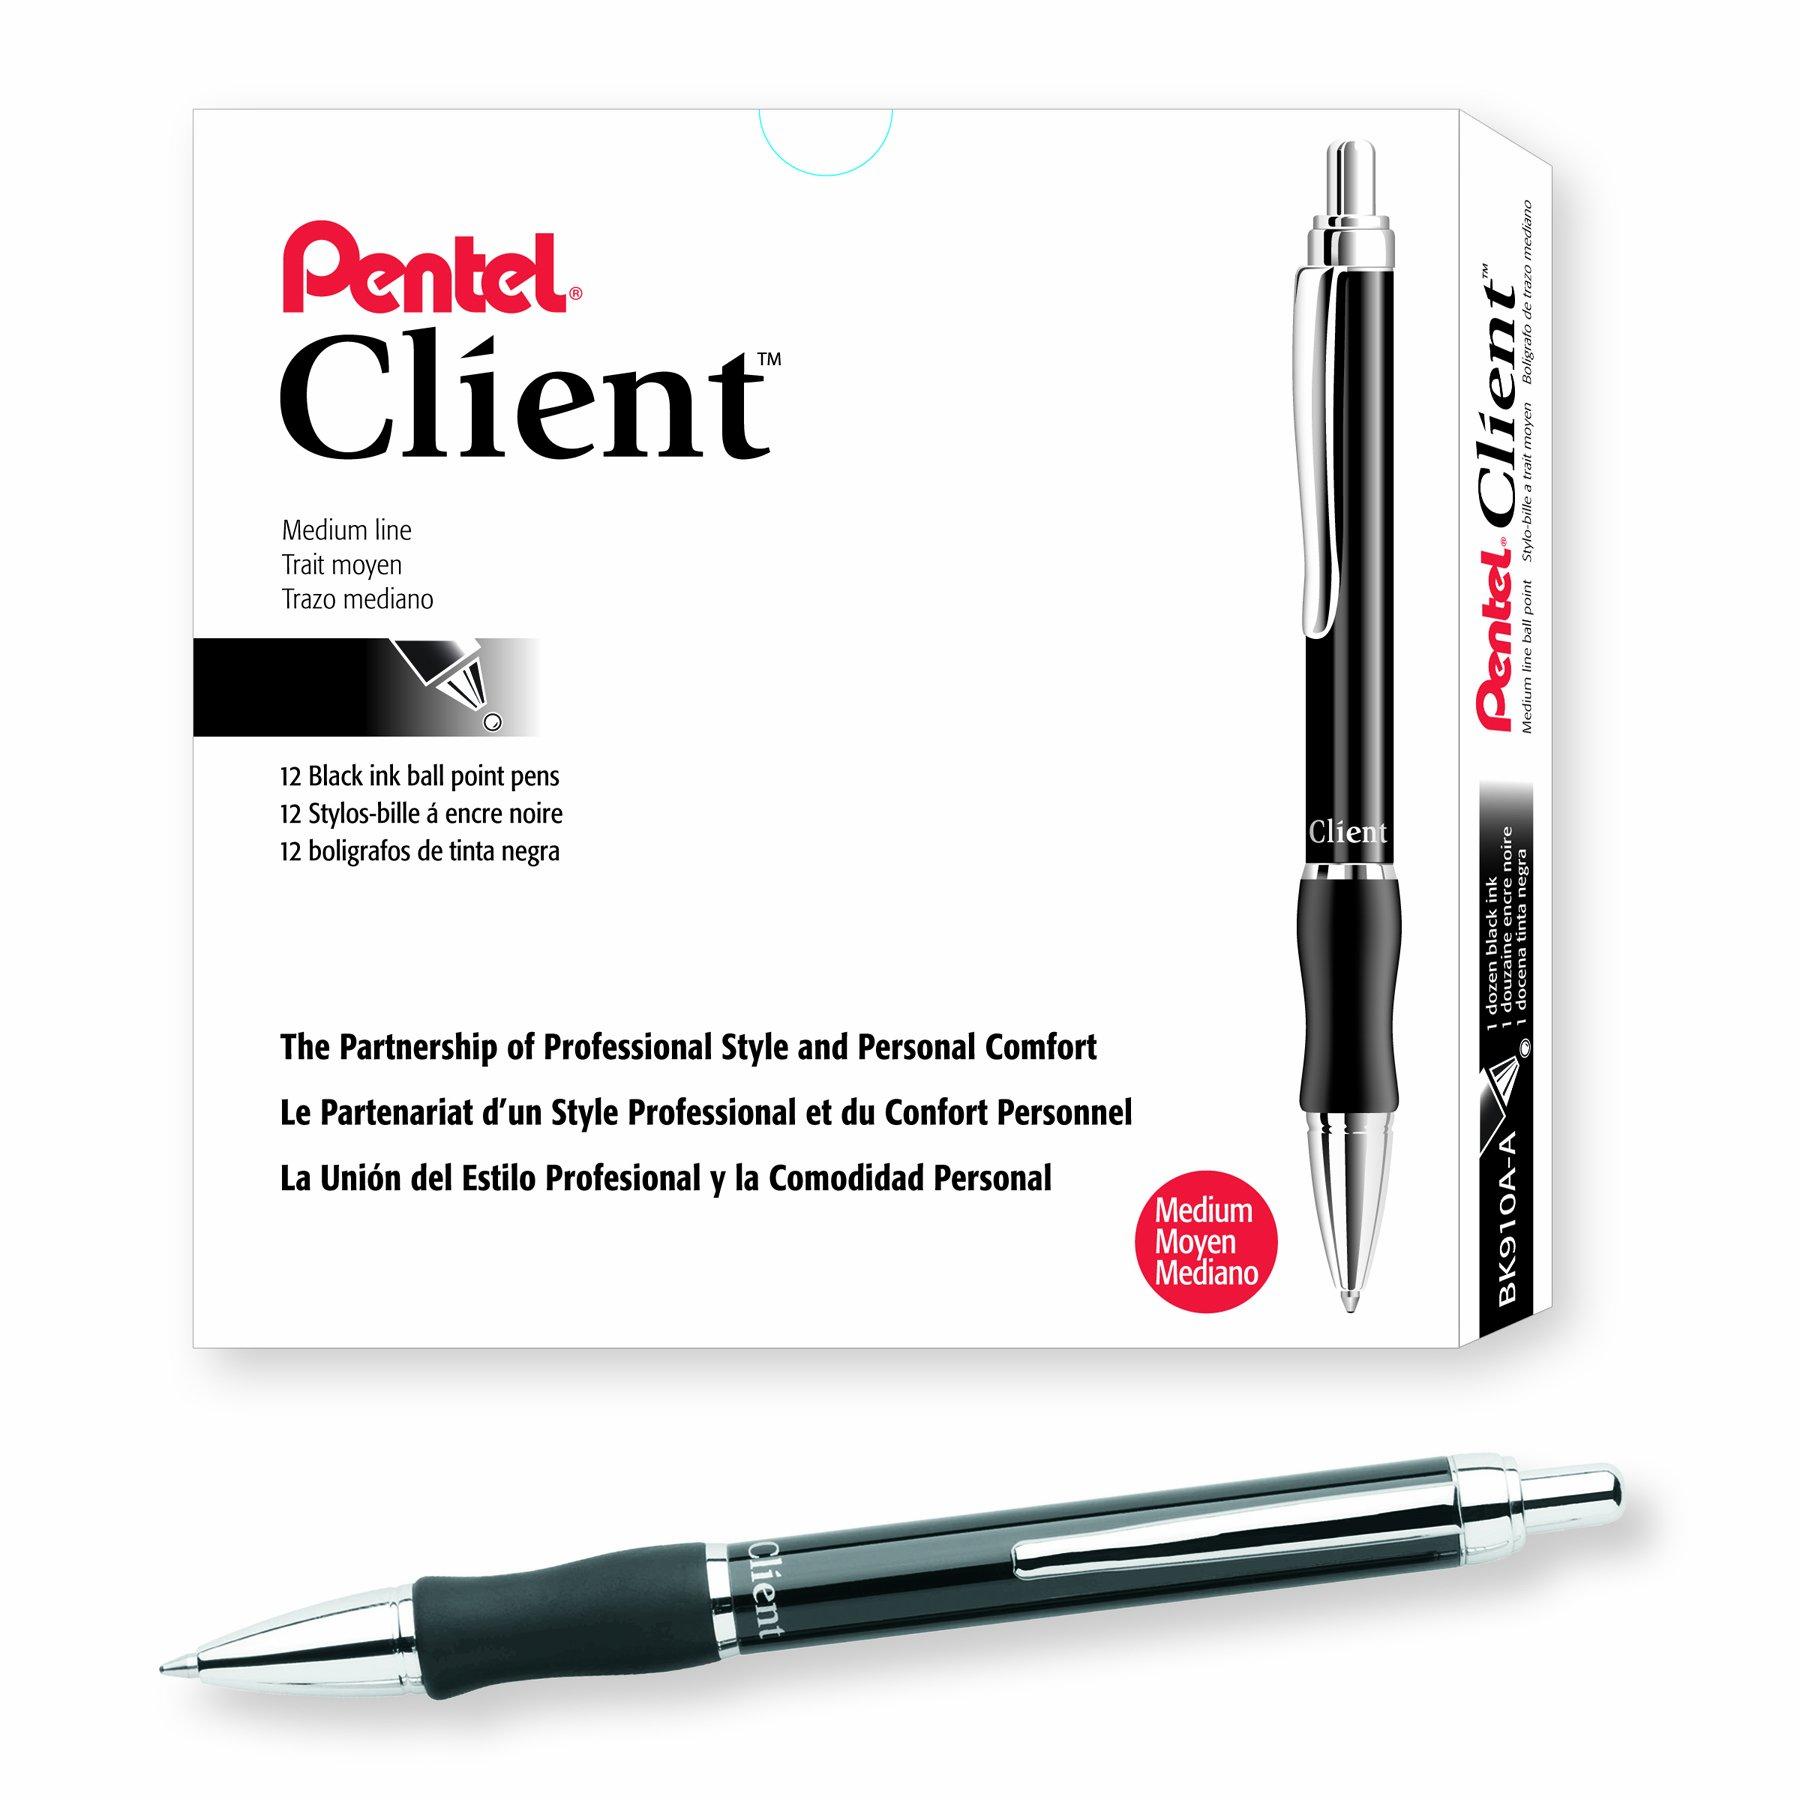 Pentel Client Retractable Ballpoint Pen, Medium Line, Black.